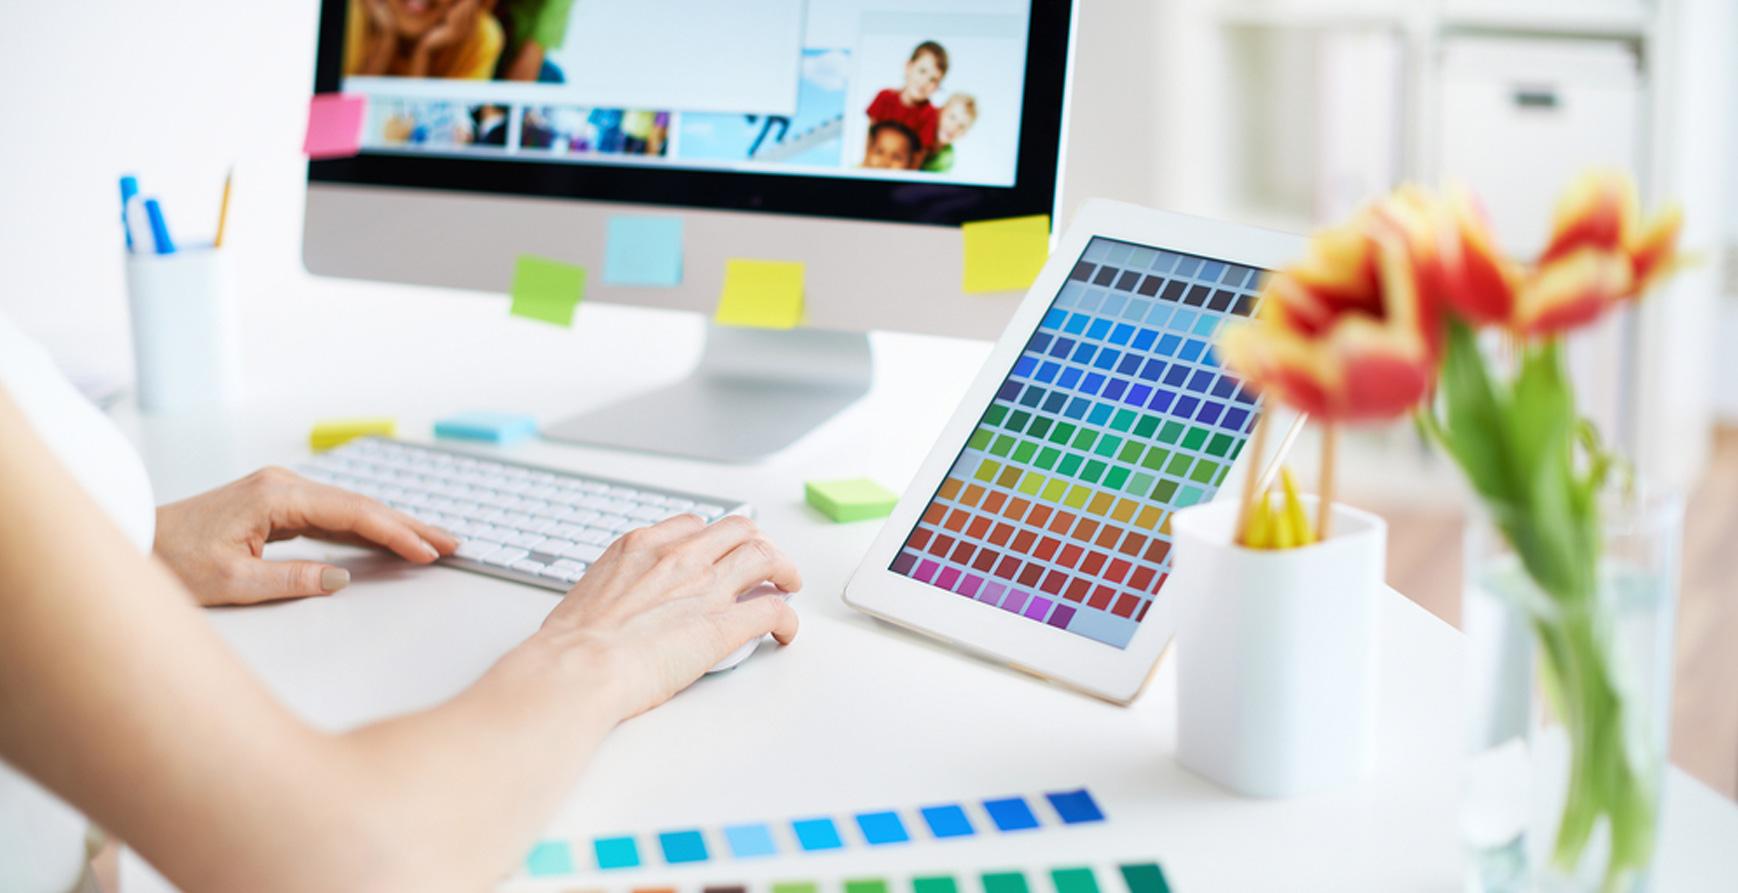 how to choose a good web designer